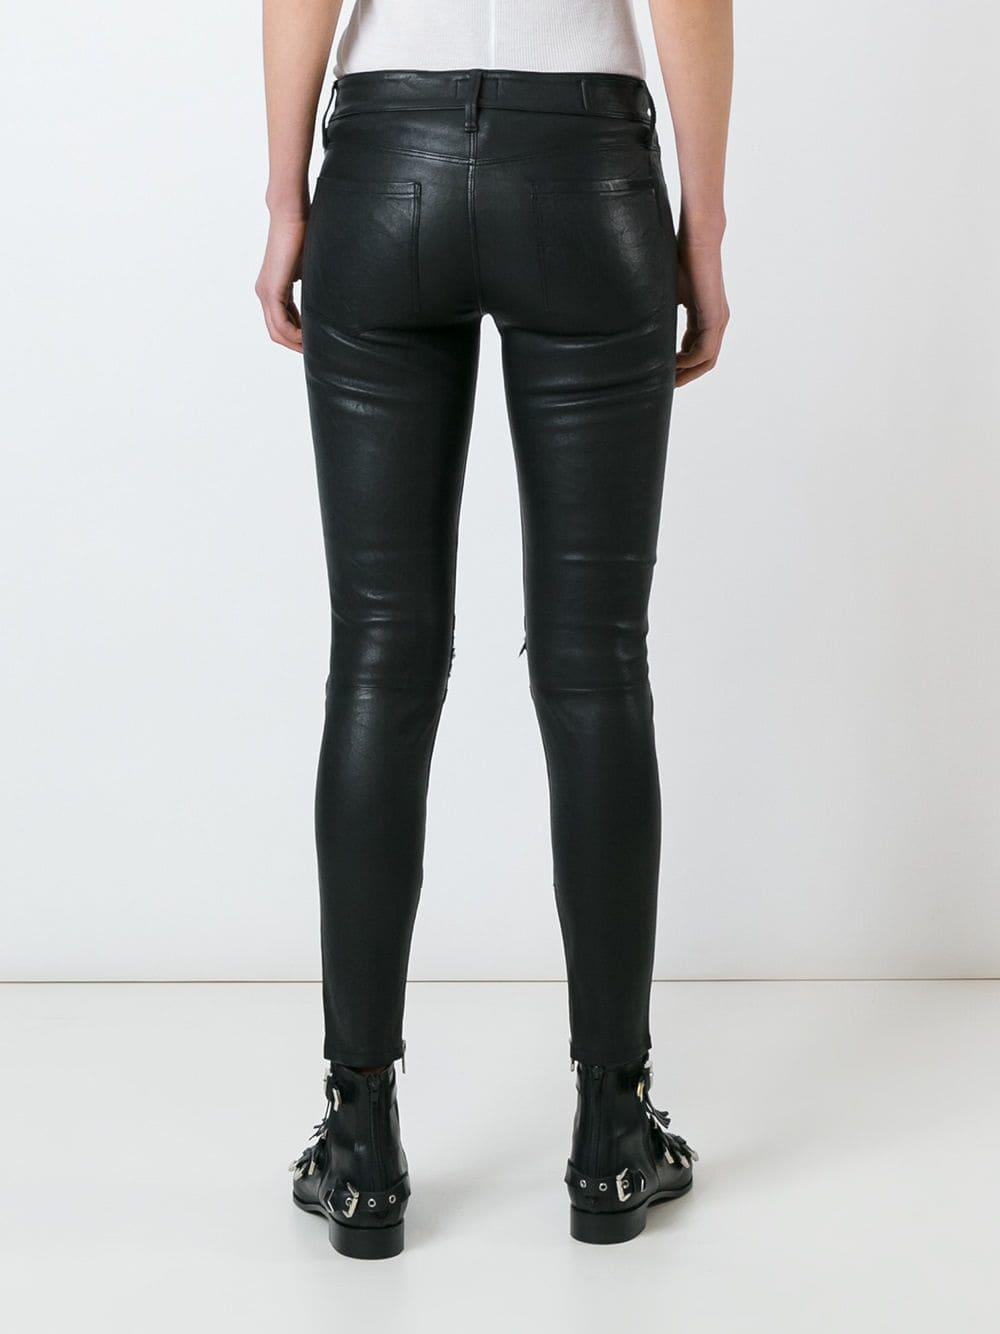 original large discount women Women's Black Distressed Leather Pants